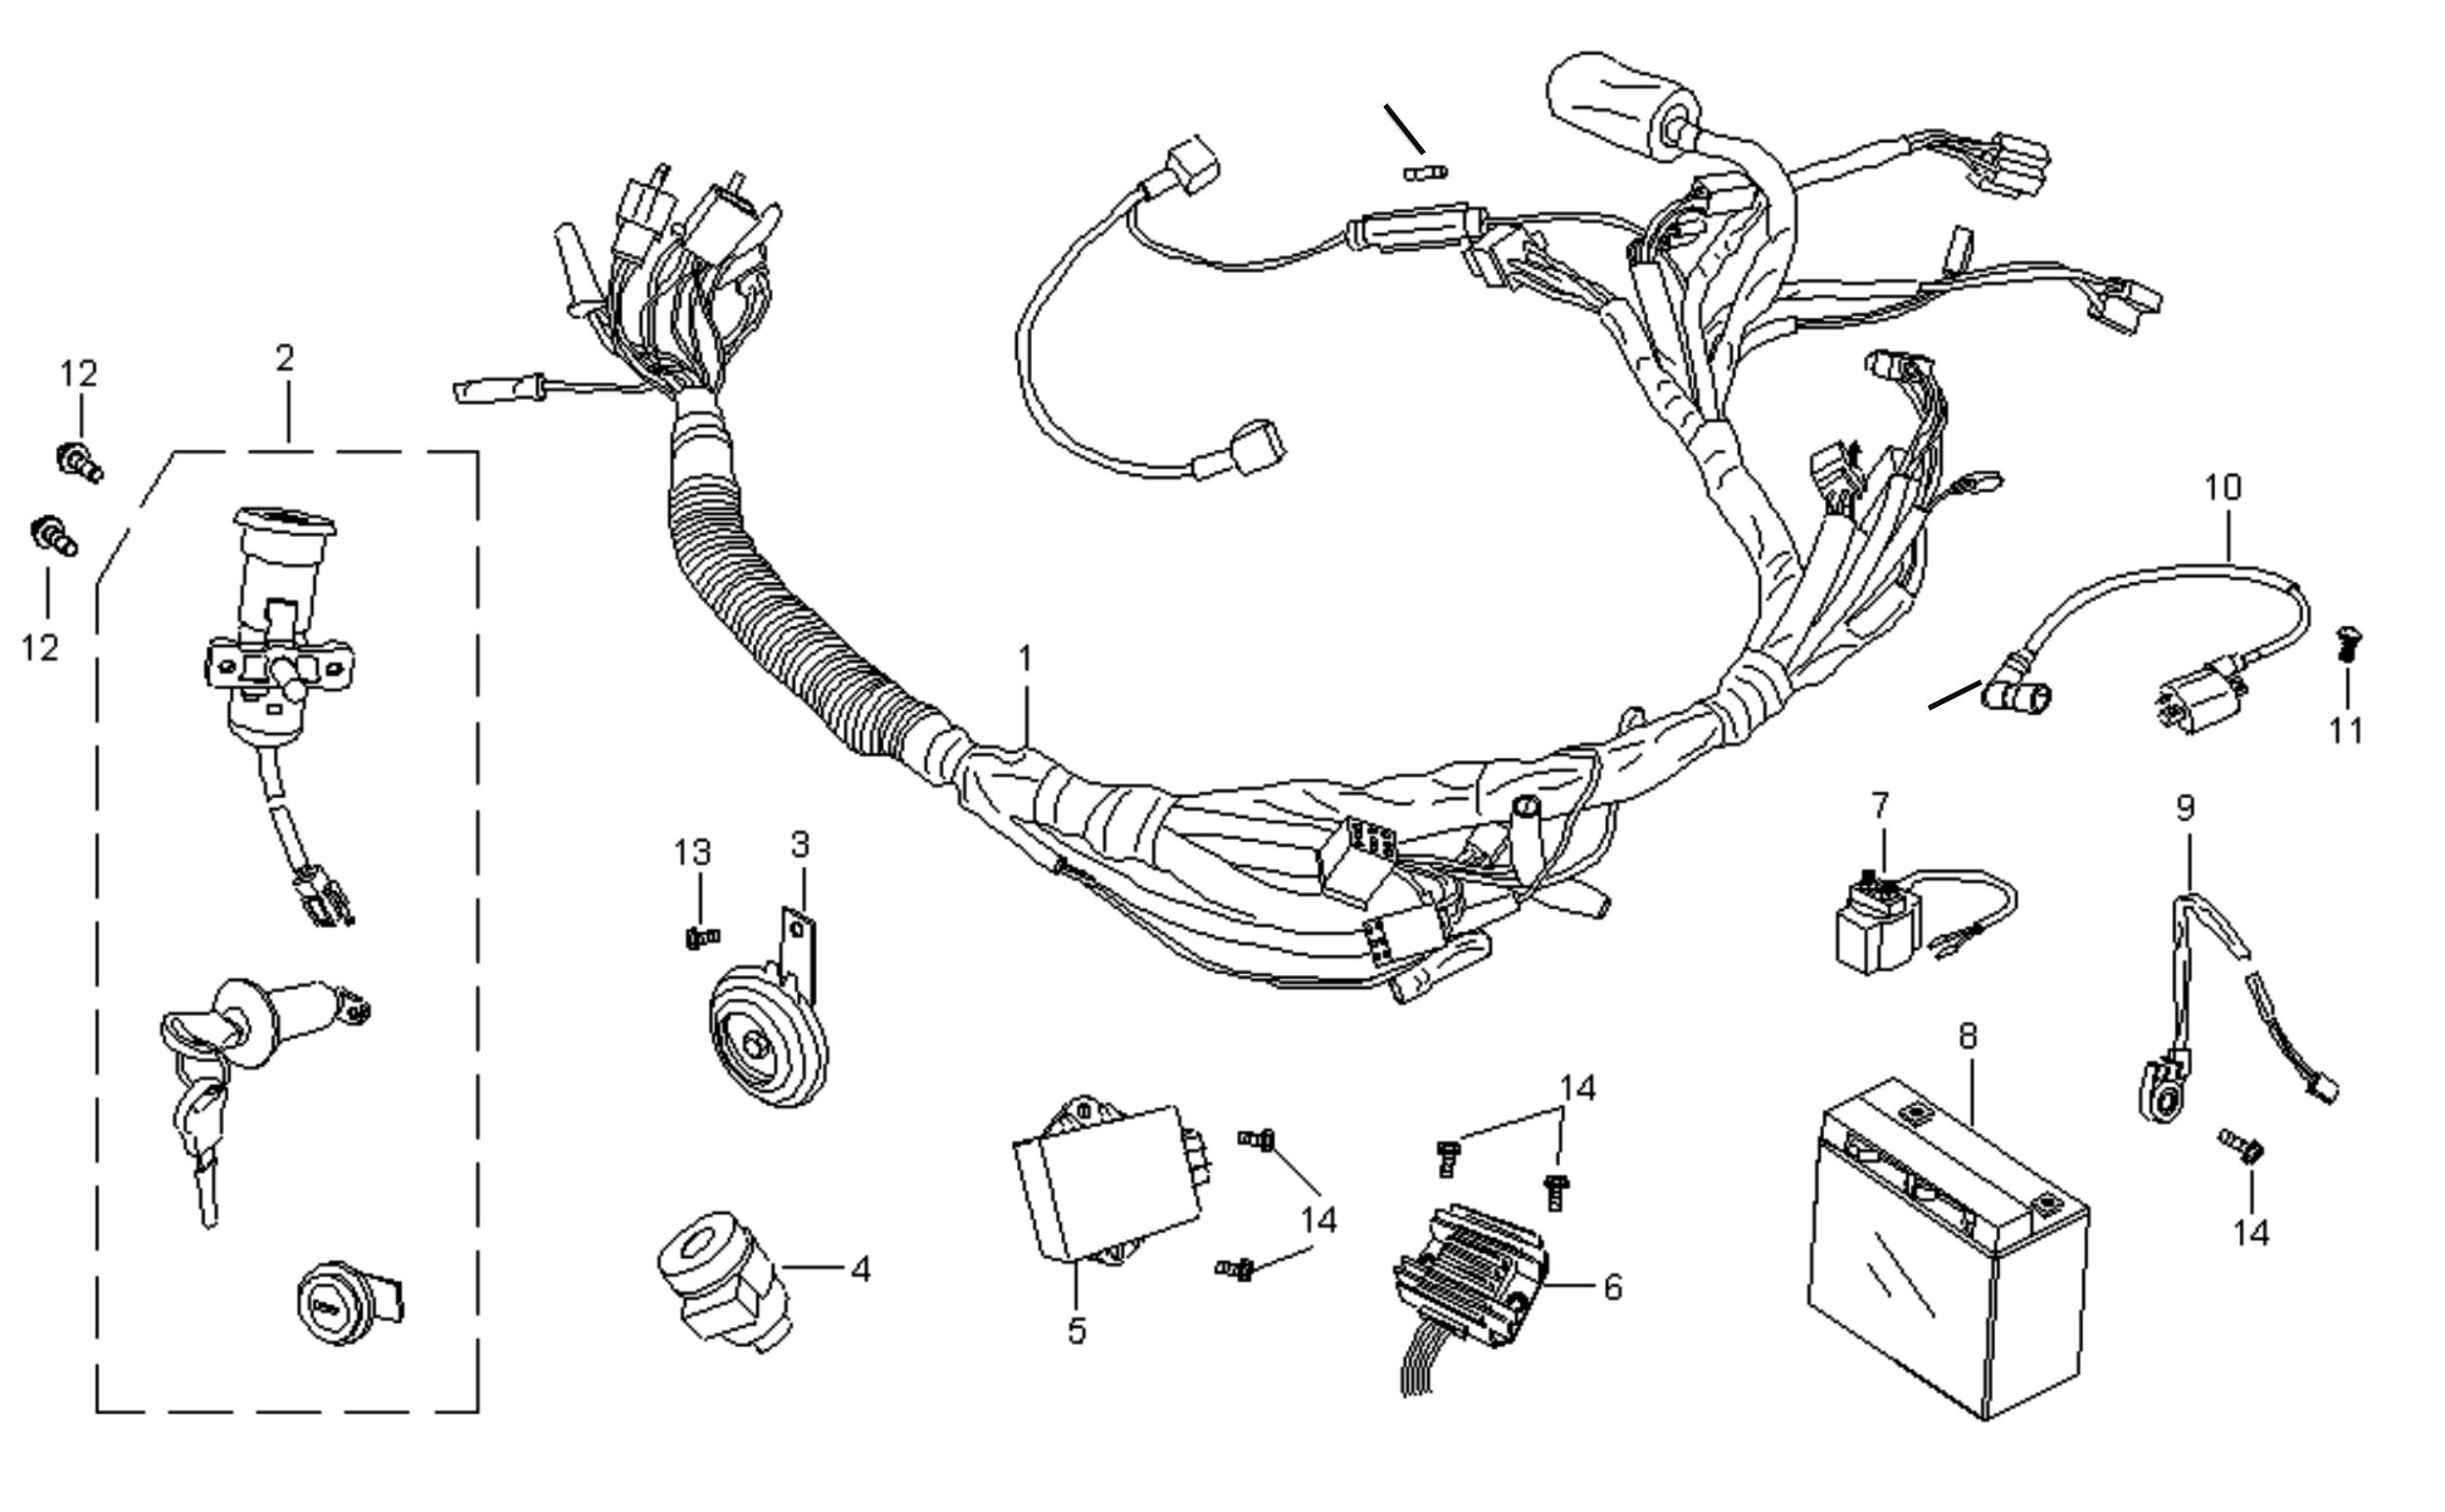 Elektrik / Kabelbaum